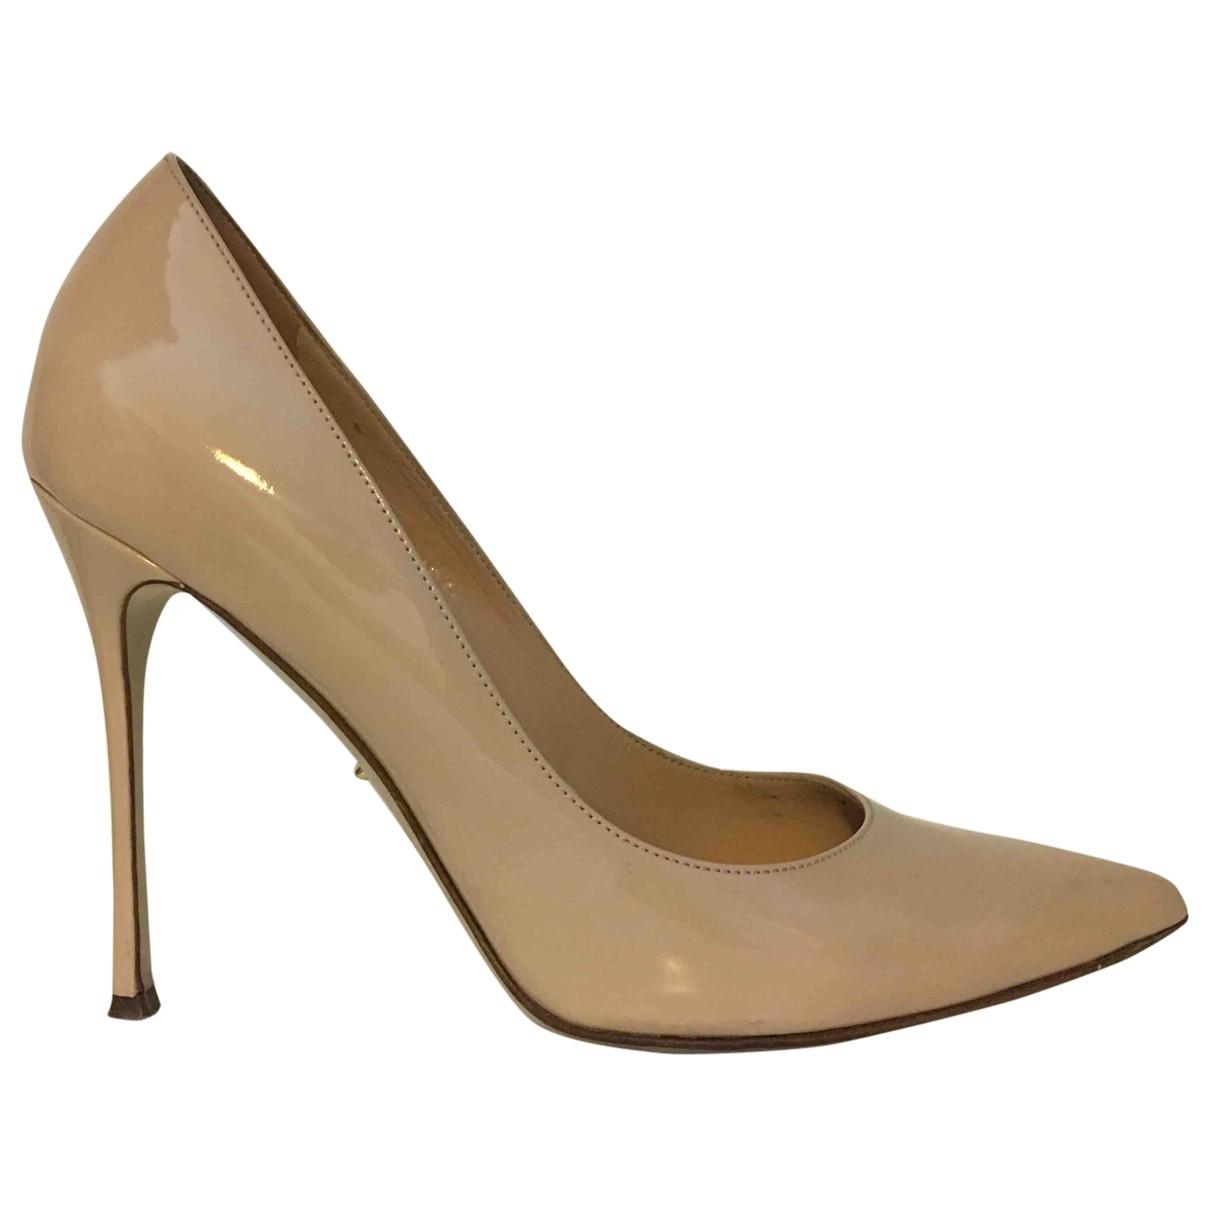 Sergio Rossi \N Beige Patent leather Heels for Women 38 EU